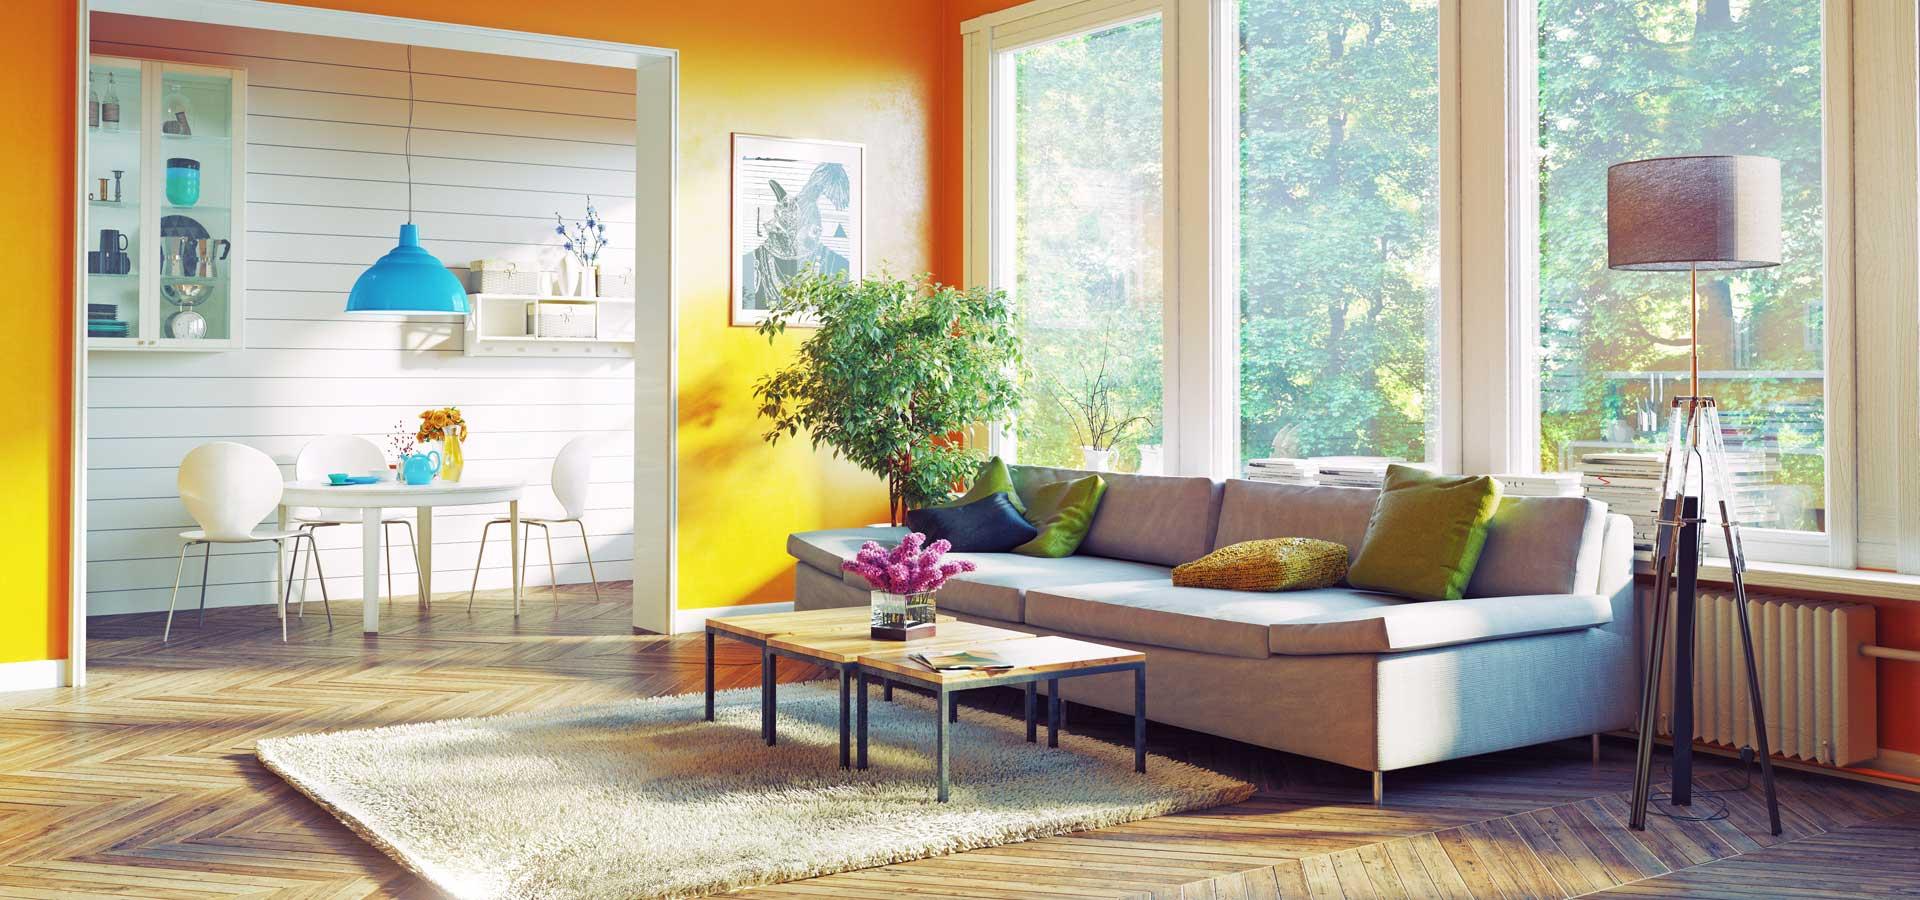 Suunny living room